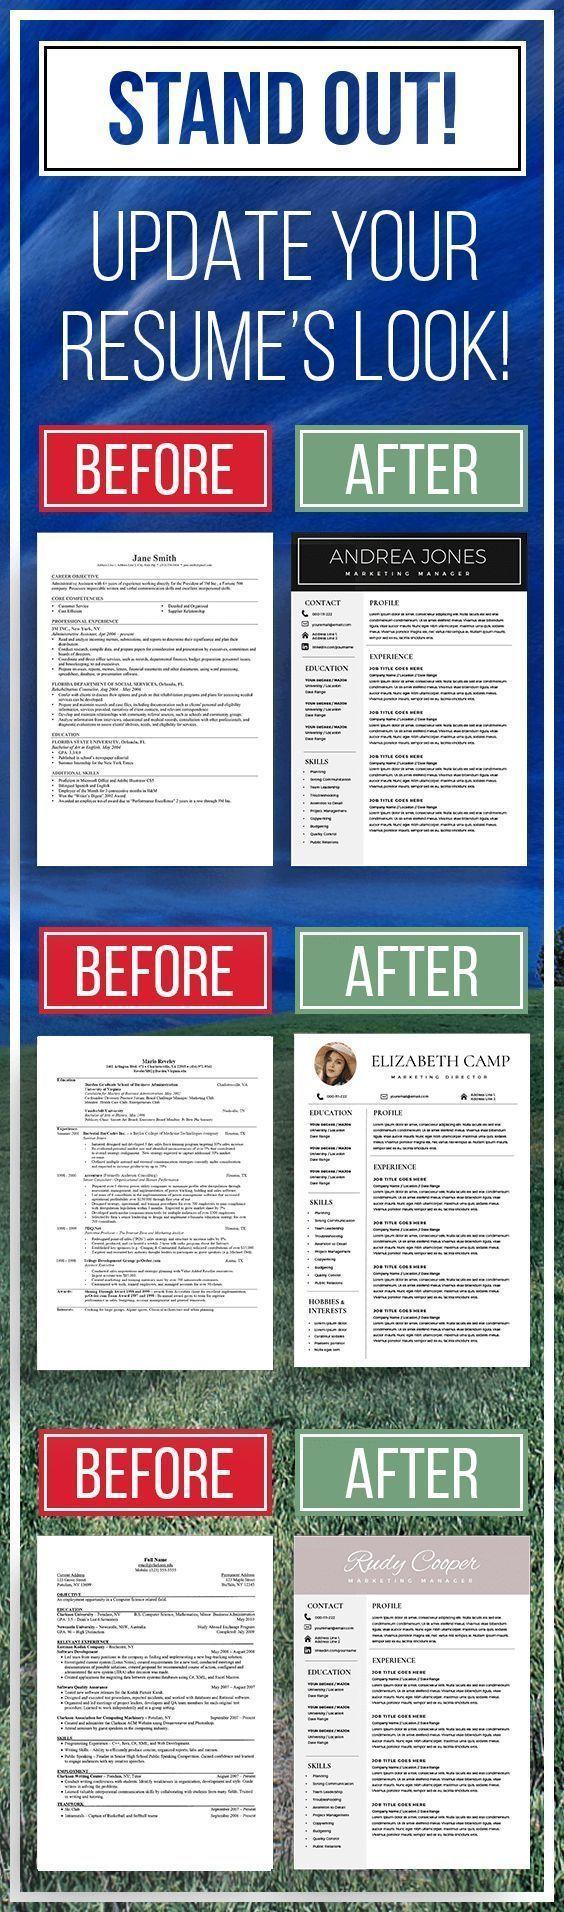 7 best Public Relations (PR) Resume Templates & Samples images on ...